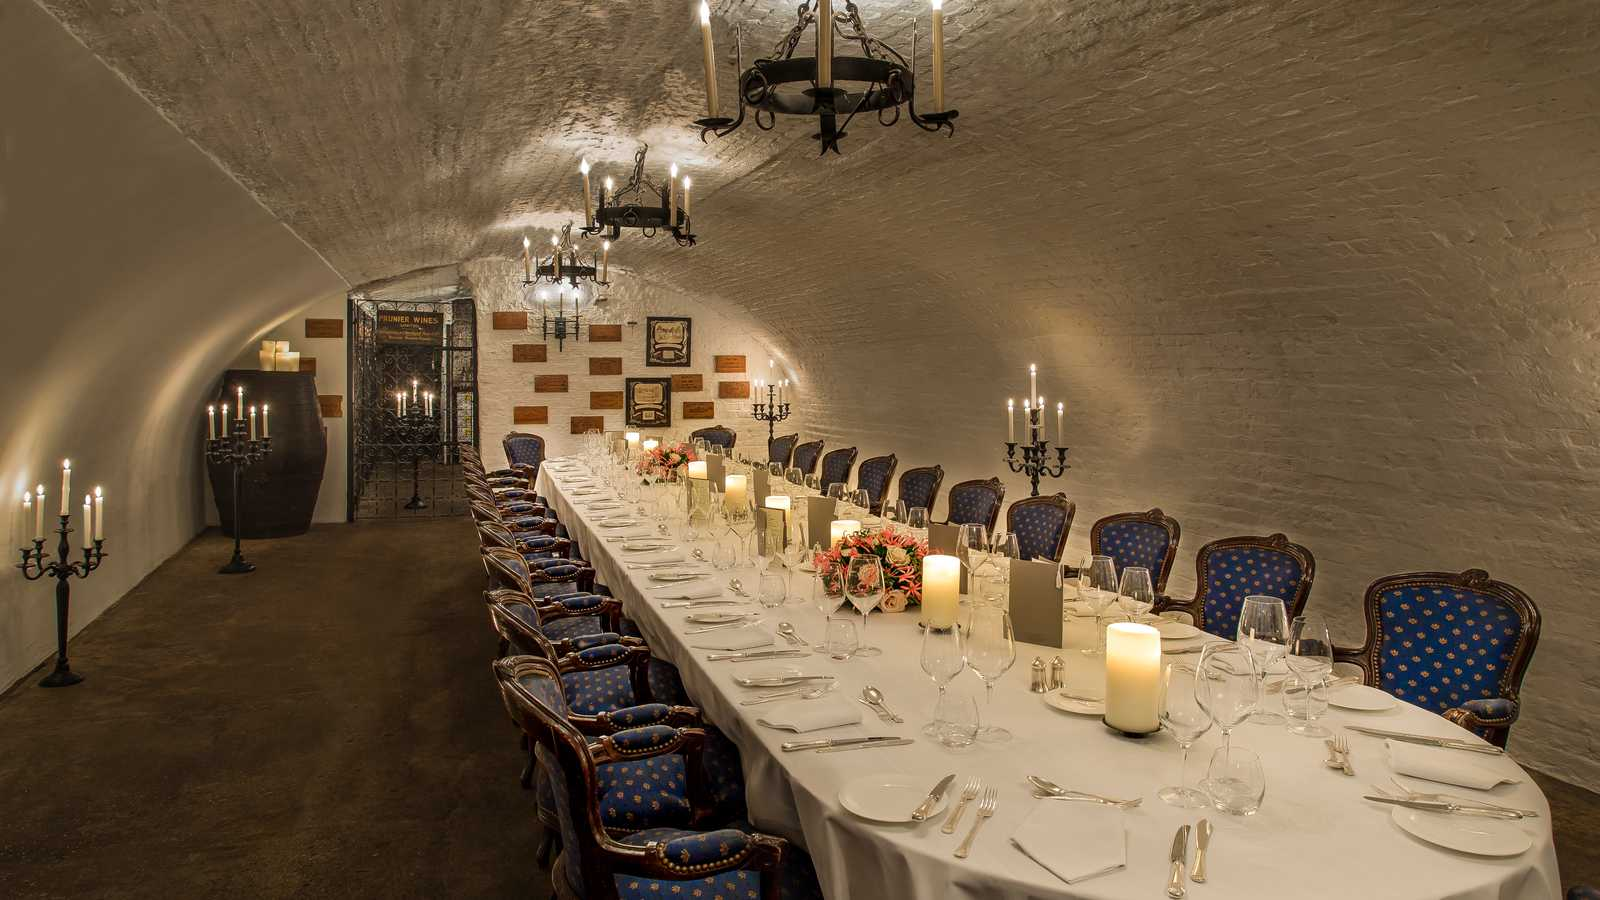 The Wine Cellars